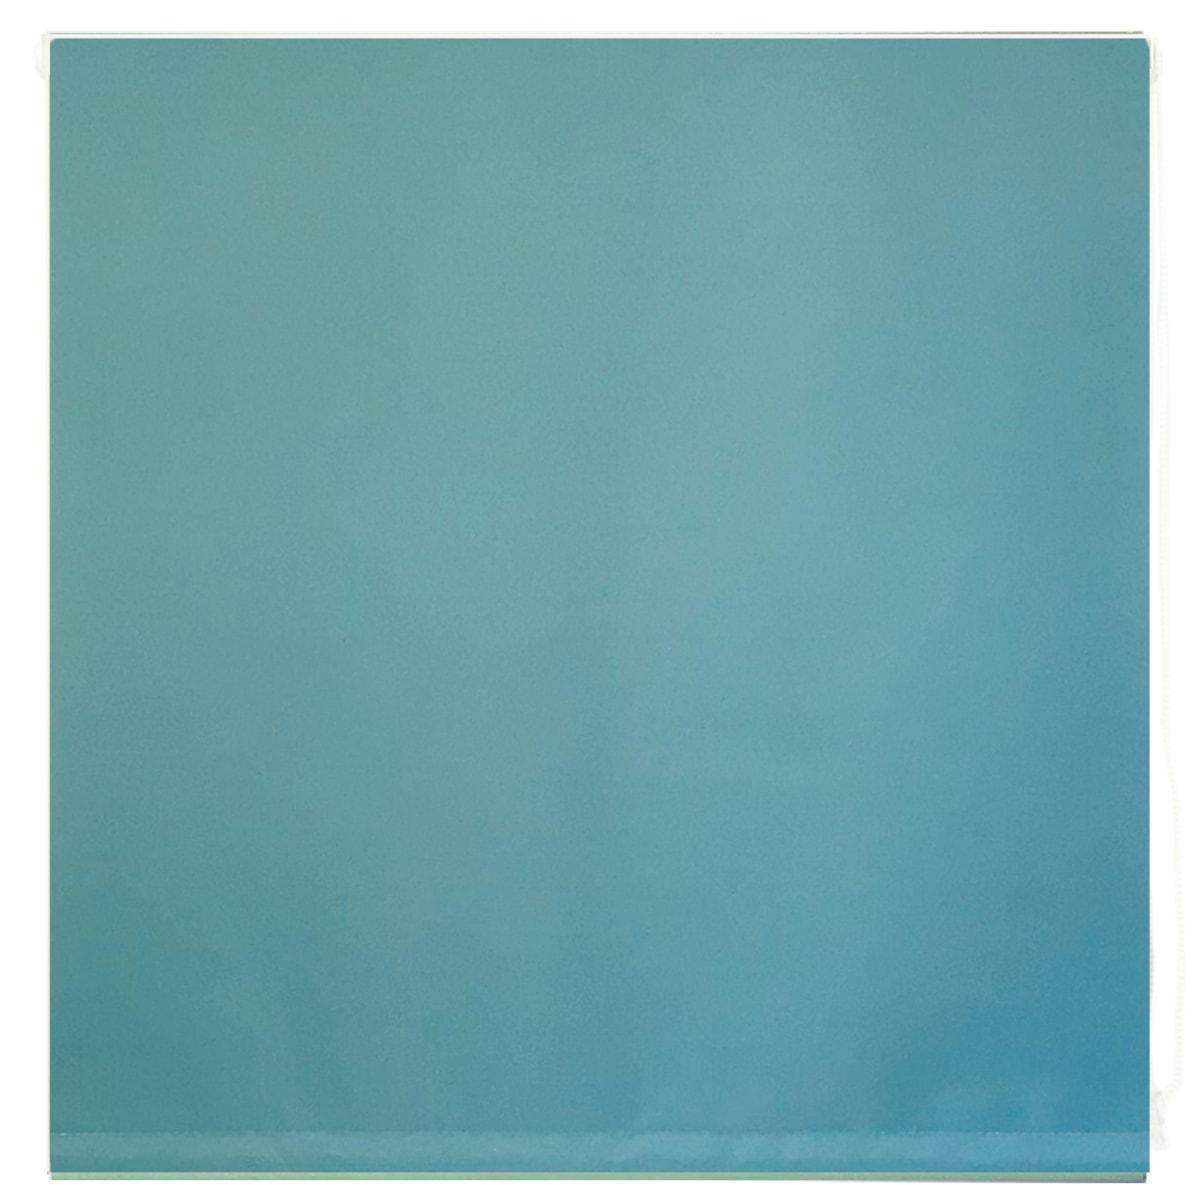 Штора рулонная Blackout Inspire, 140х175 см, цвет голубой